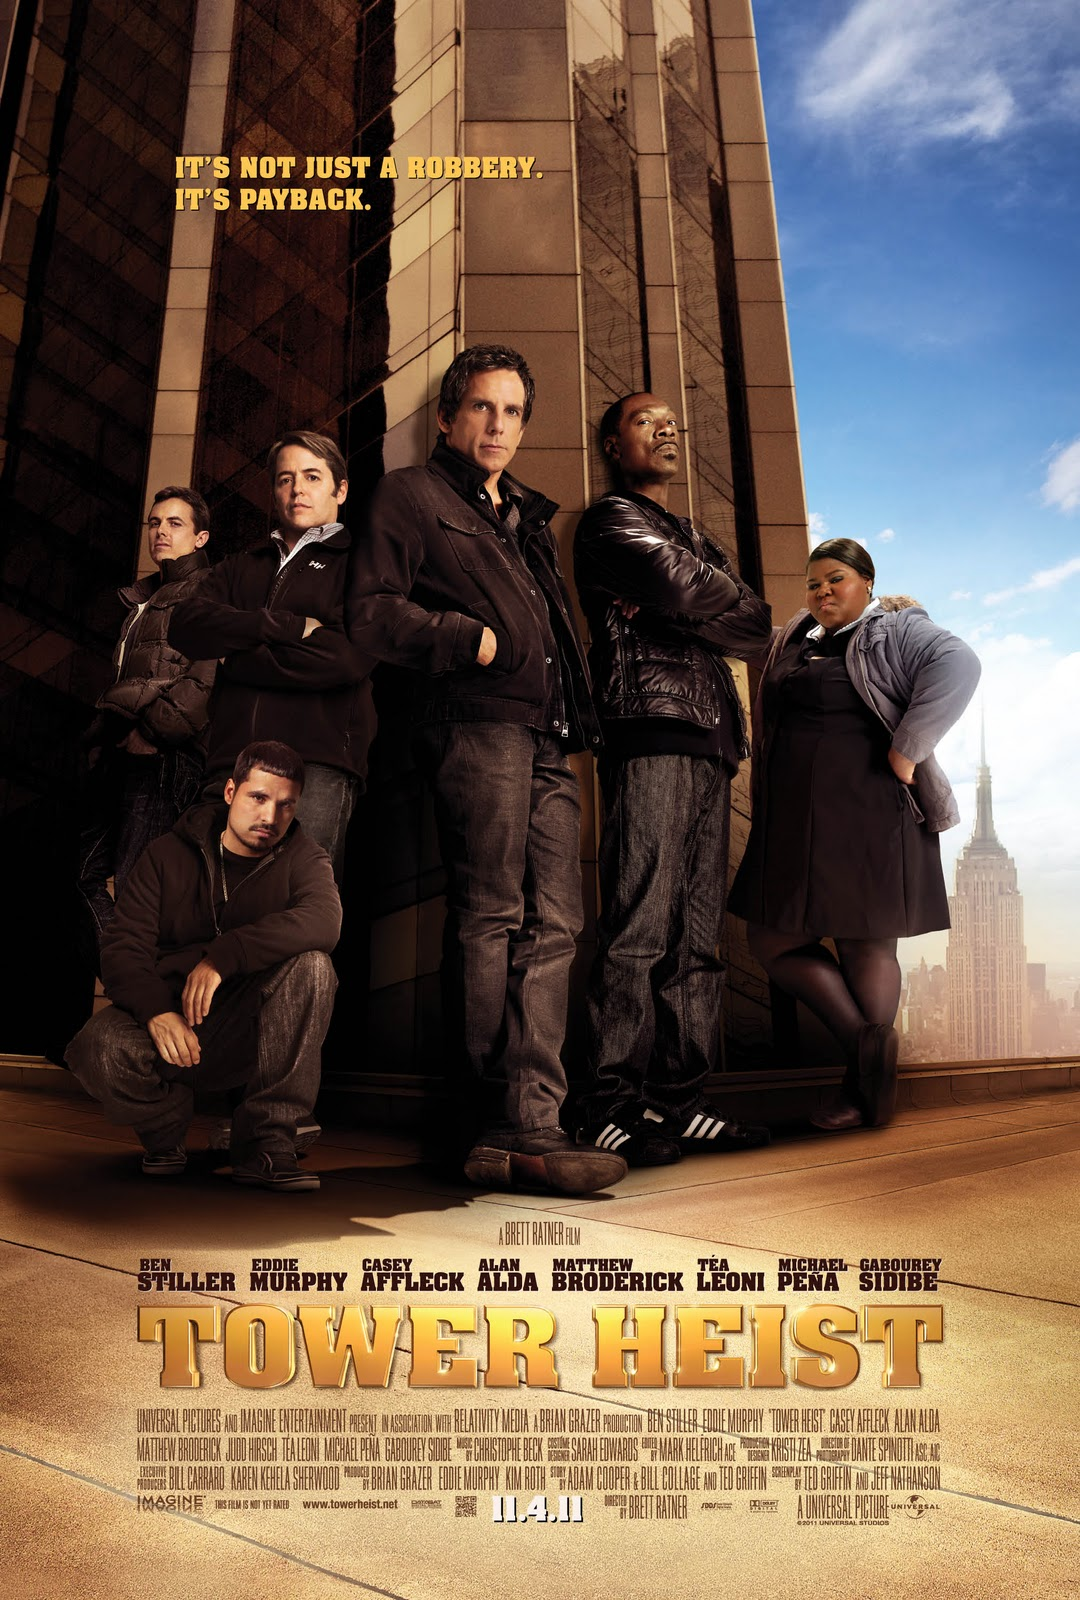 http://3.bp.blogspot.com/-MGYYq8xBWsA/TrnMwW0QKKI/AAAAAAAADHQ/SoPD8Kaf6bQ/s1600/tower-heist-movie-poster-hi-res-01.jpg